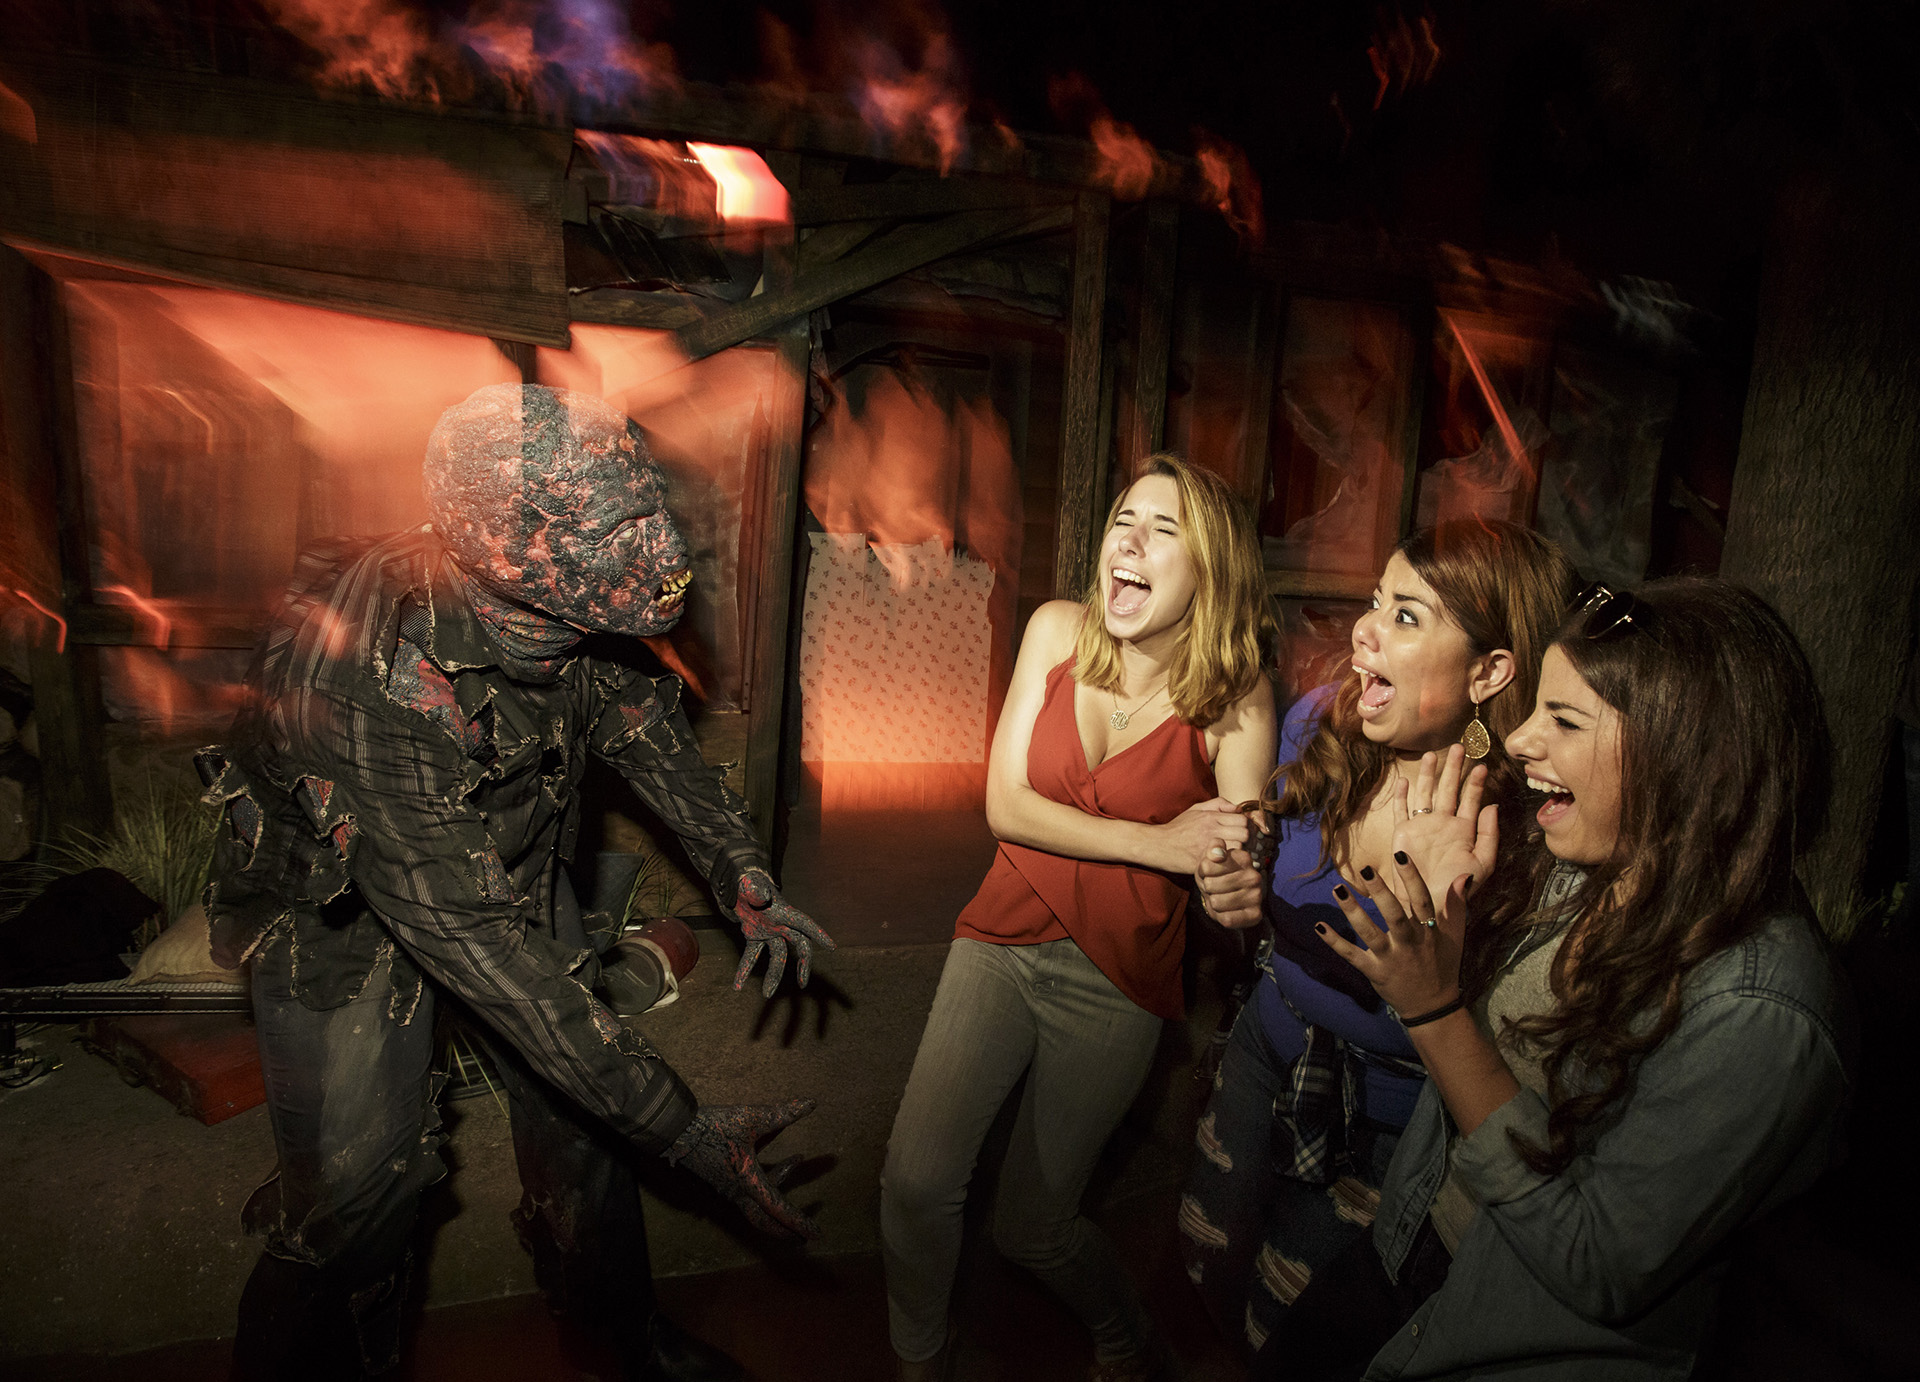 Photo courtesy of Universal Studios.